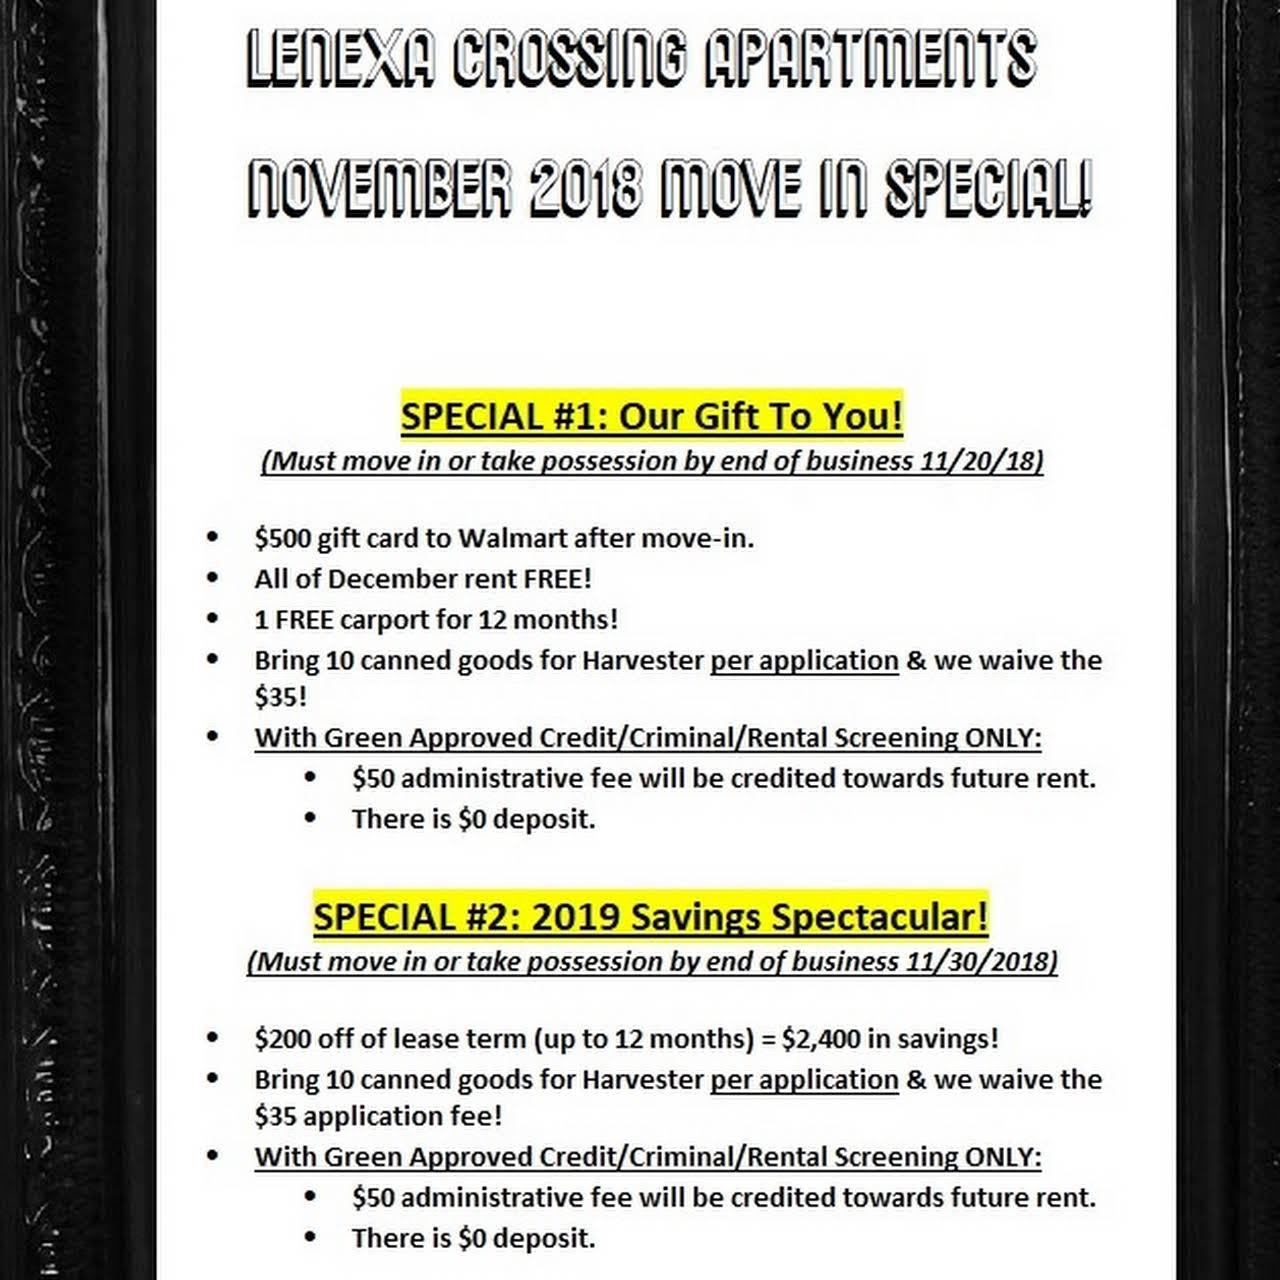 Lenexa Crossing Apartments - Apartment Complex in Lenexa